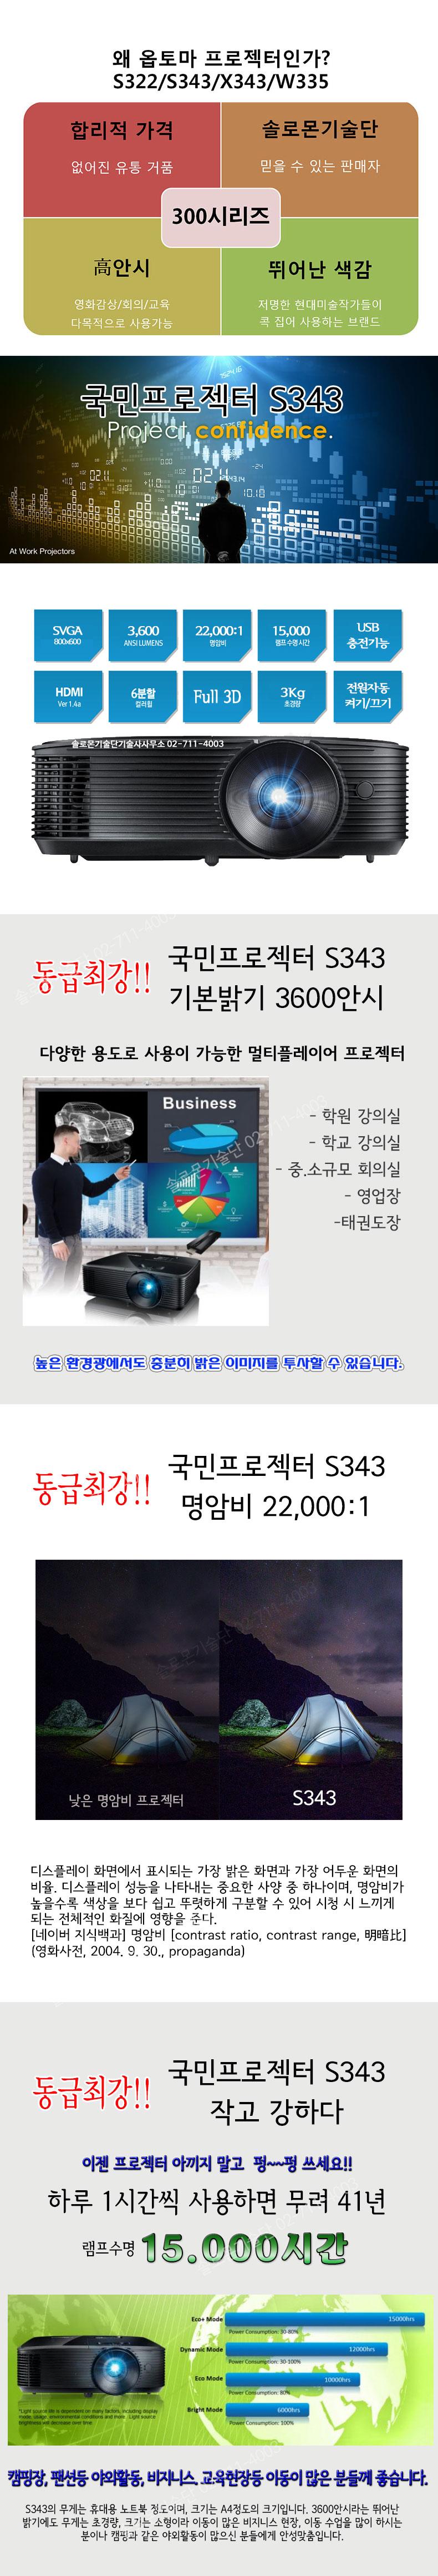 s343 옵토마 svga 프로젝터 3600안시 s343